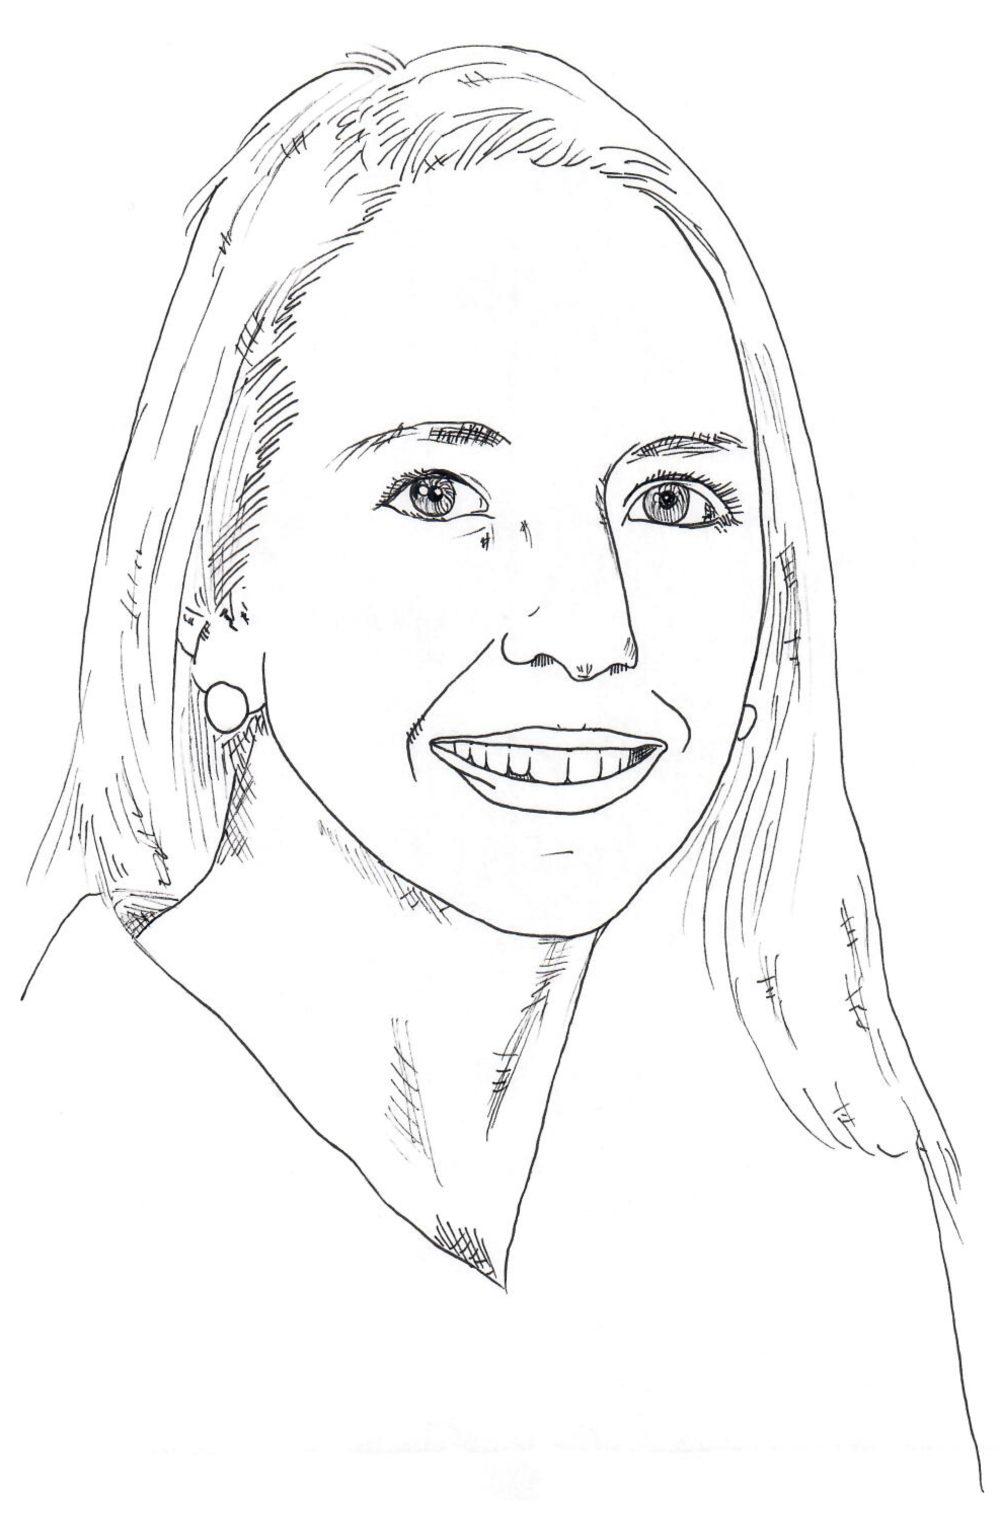 Claire Perrott, Researcher